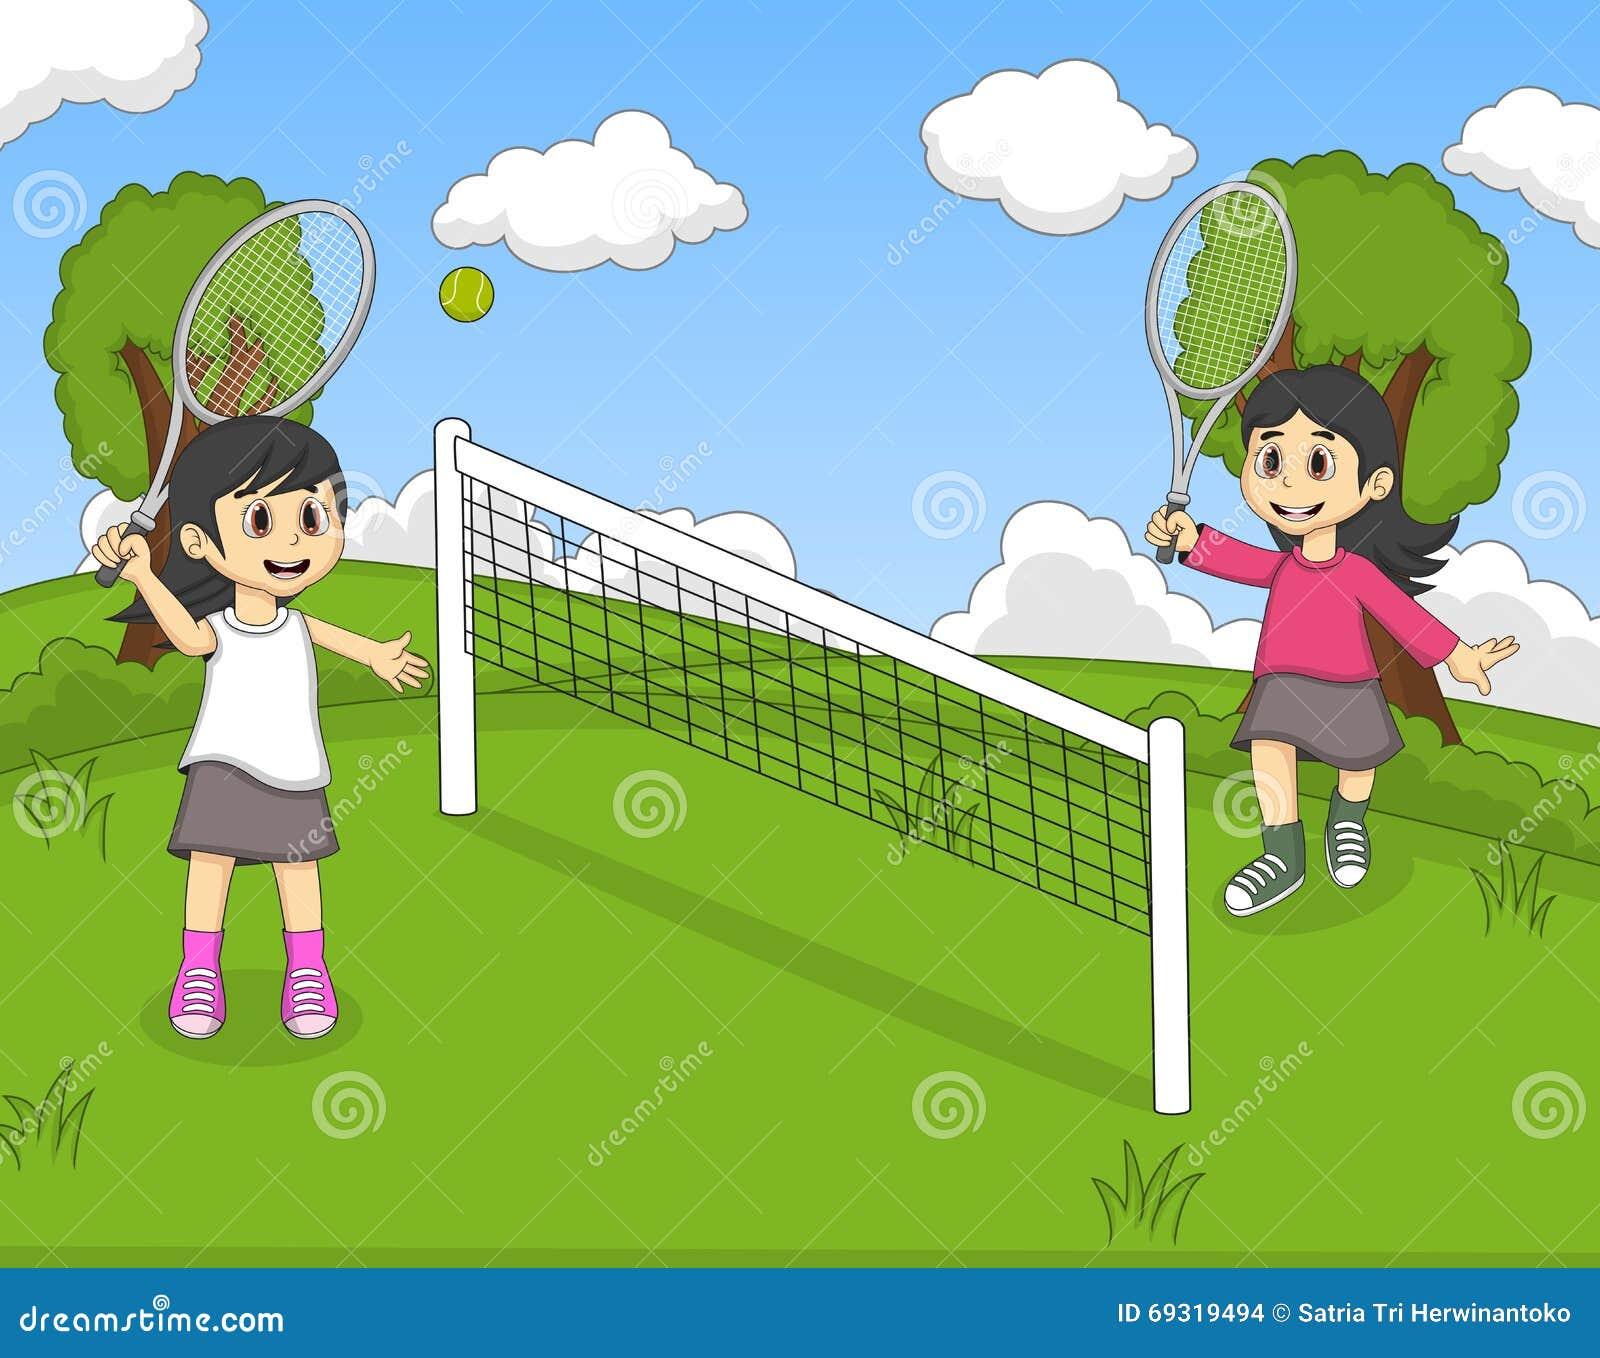 Children Playing Tennis In The Park Cartoon Stock Vector